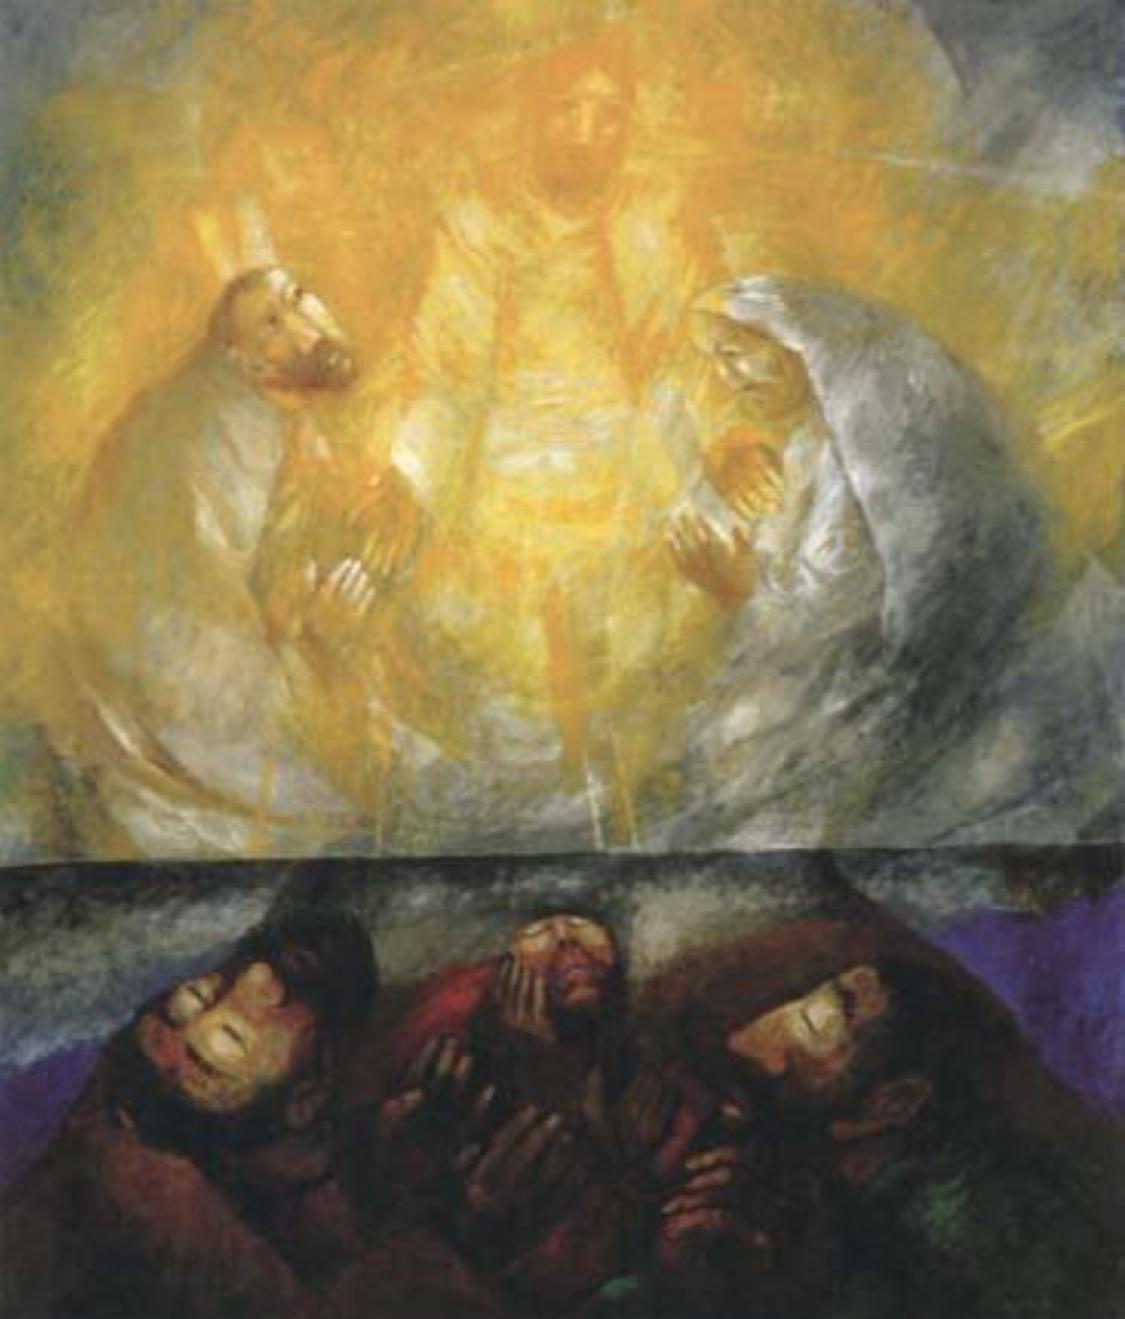 Sieger Koder: The transfiguration